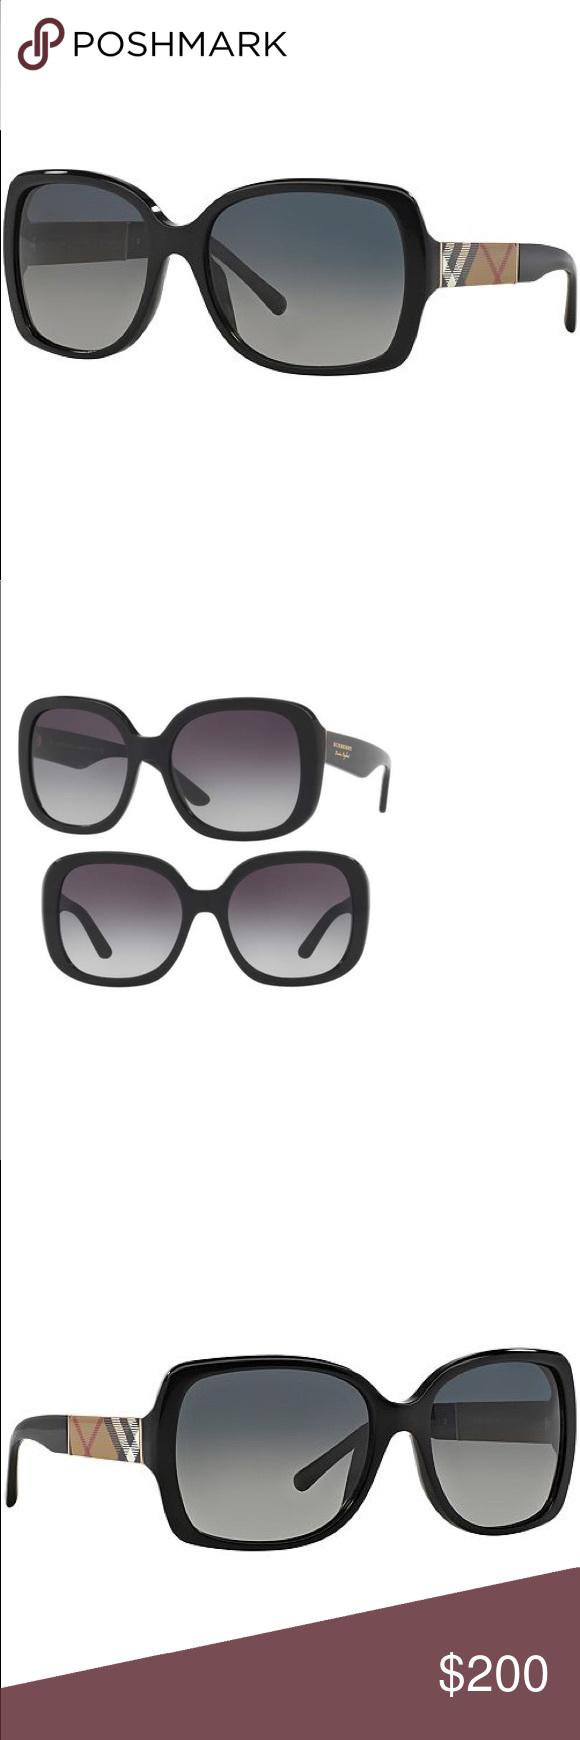 8dd7397143fd Burberry Luxottica Ladies  Black Sunglasses...stunning!! Very Jackie O!! Burberry  Accessories Sunglasses